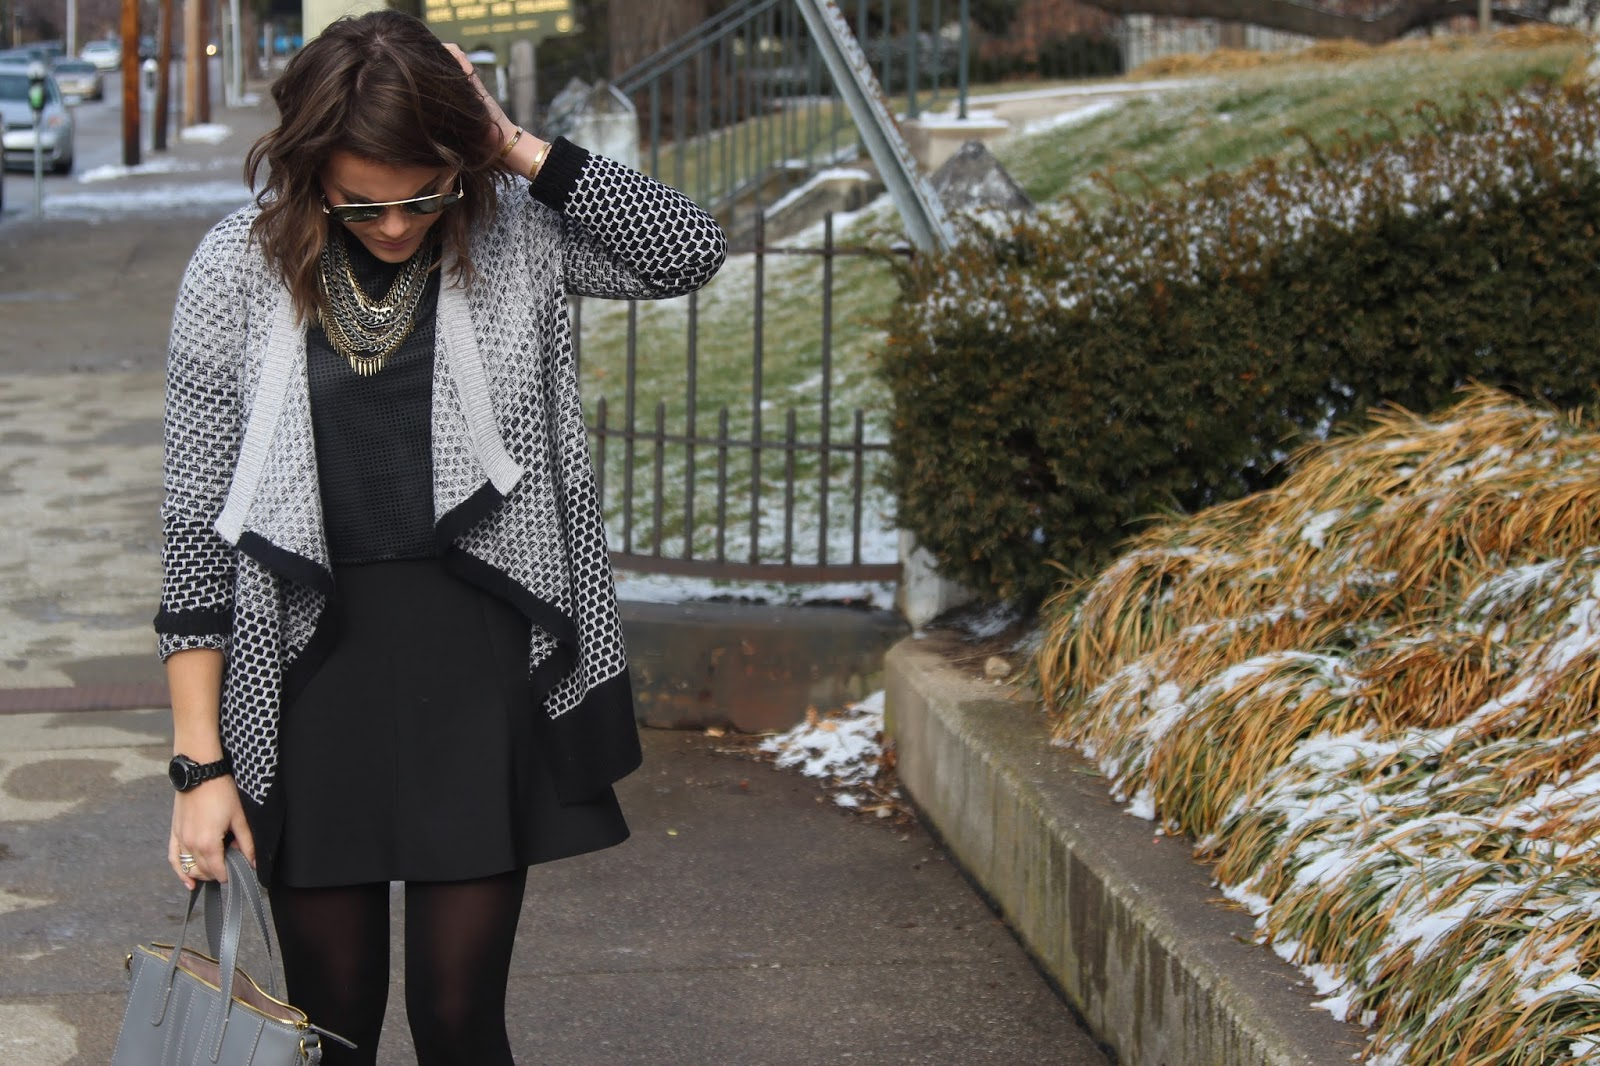 How to wear a crop top in the winter:: www.glitterandgingahm.com  | LOFT Lou & Grey Cardigan, Banana Republic Crop Top, J. Crew Skirt, J. Crew Factory Purse, ALDO Booties, Jenny Bird Artemis Collar